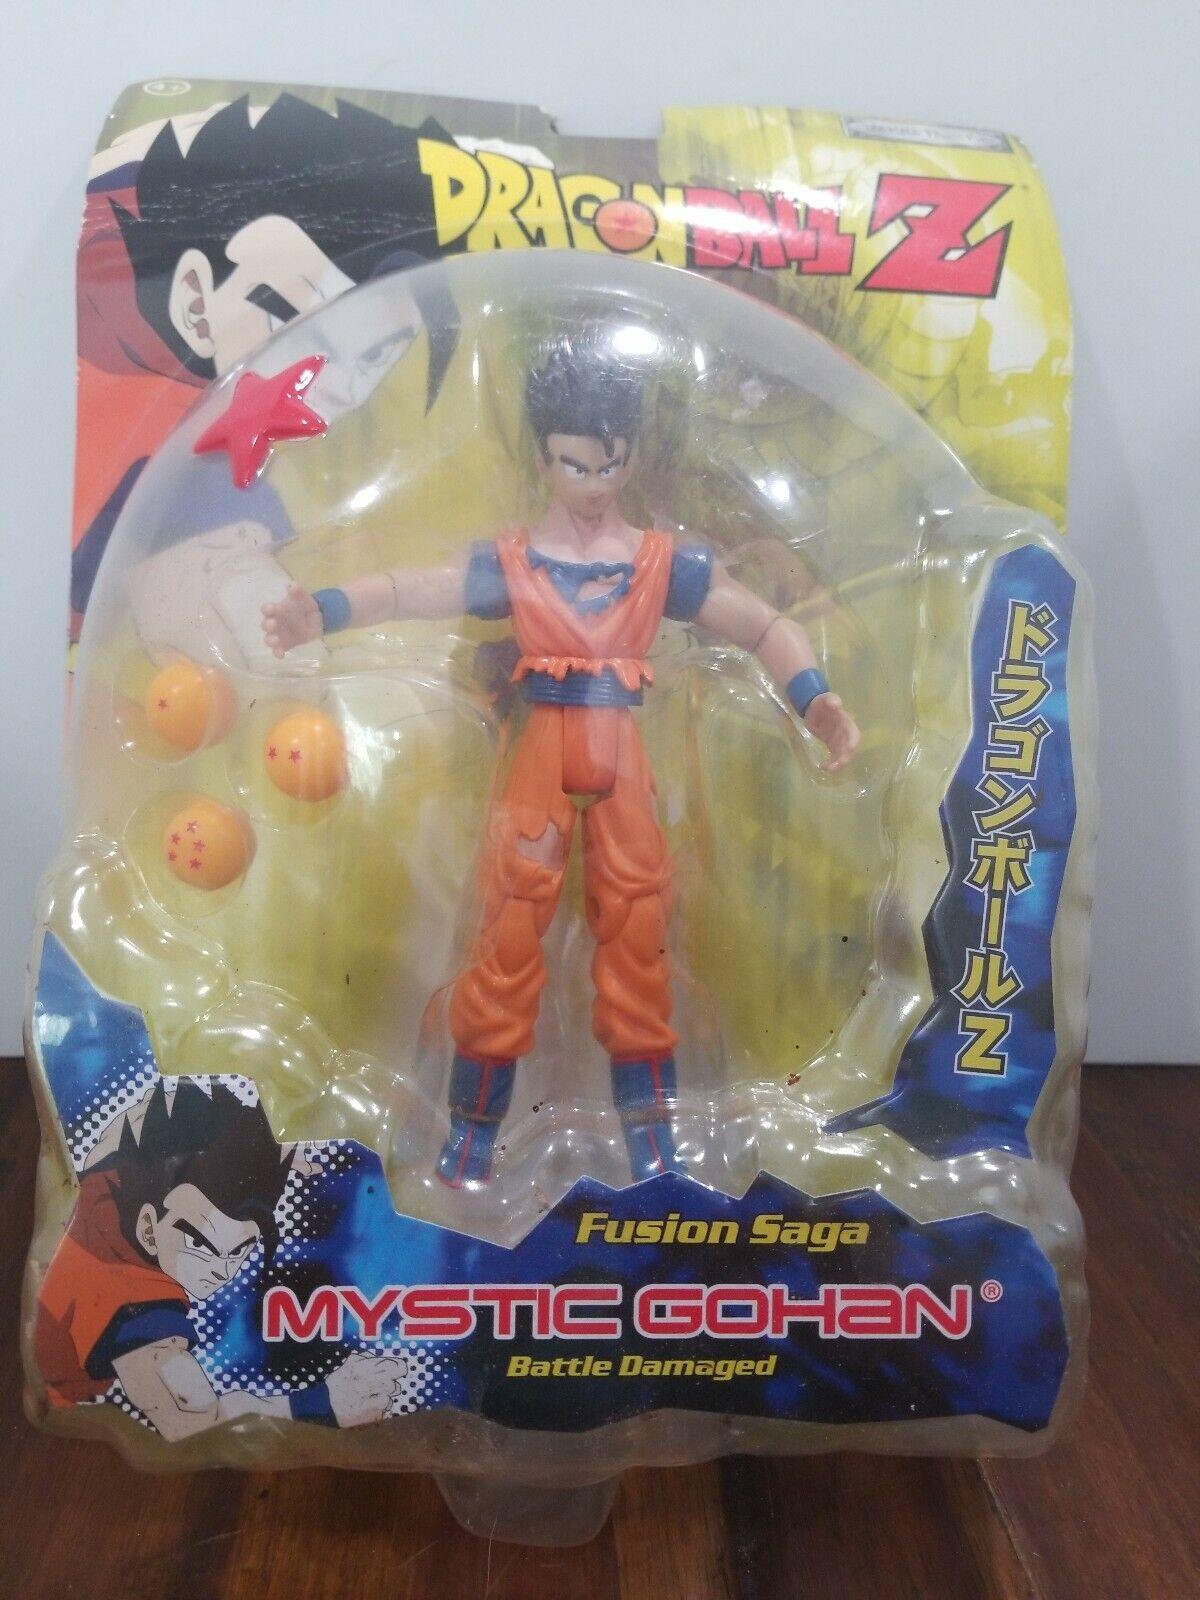 Jakks Dragon Ball Z Action Figure Fusion Saga  Battle Damaged Mystic Gohan NIP